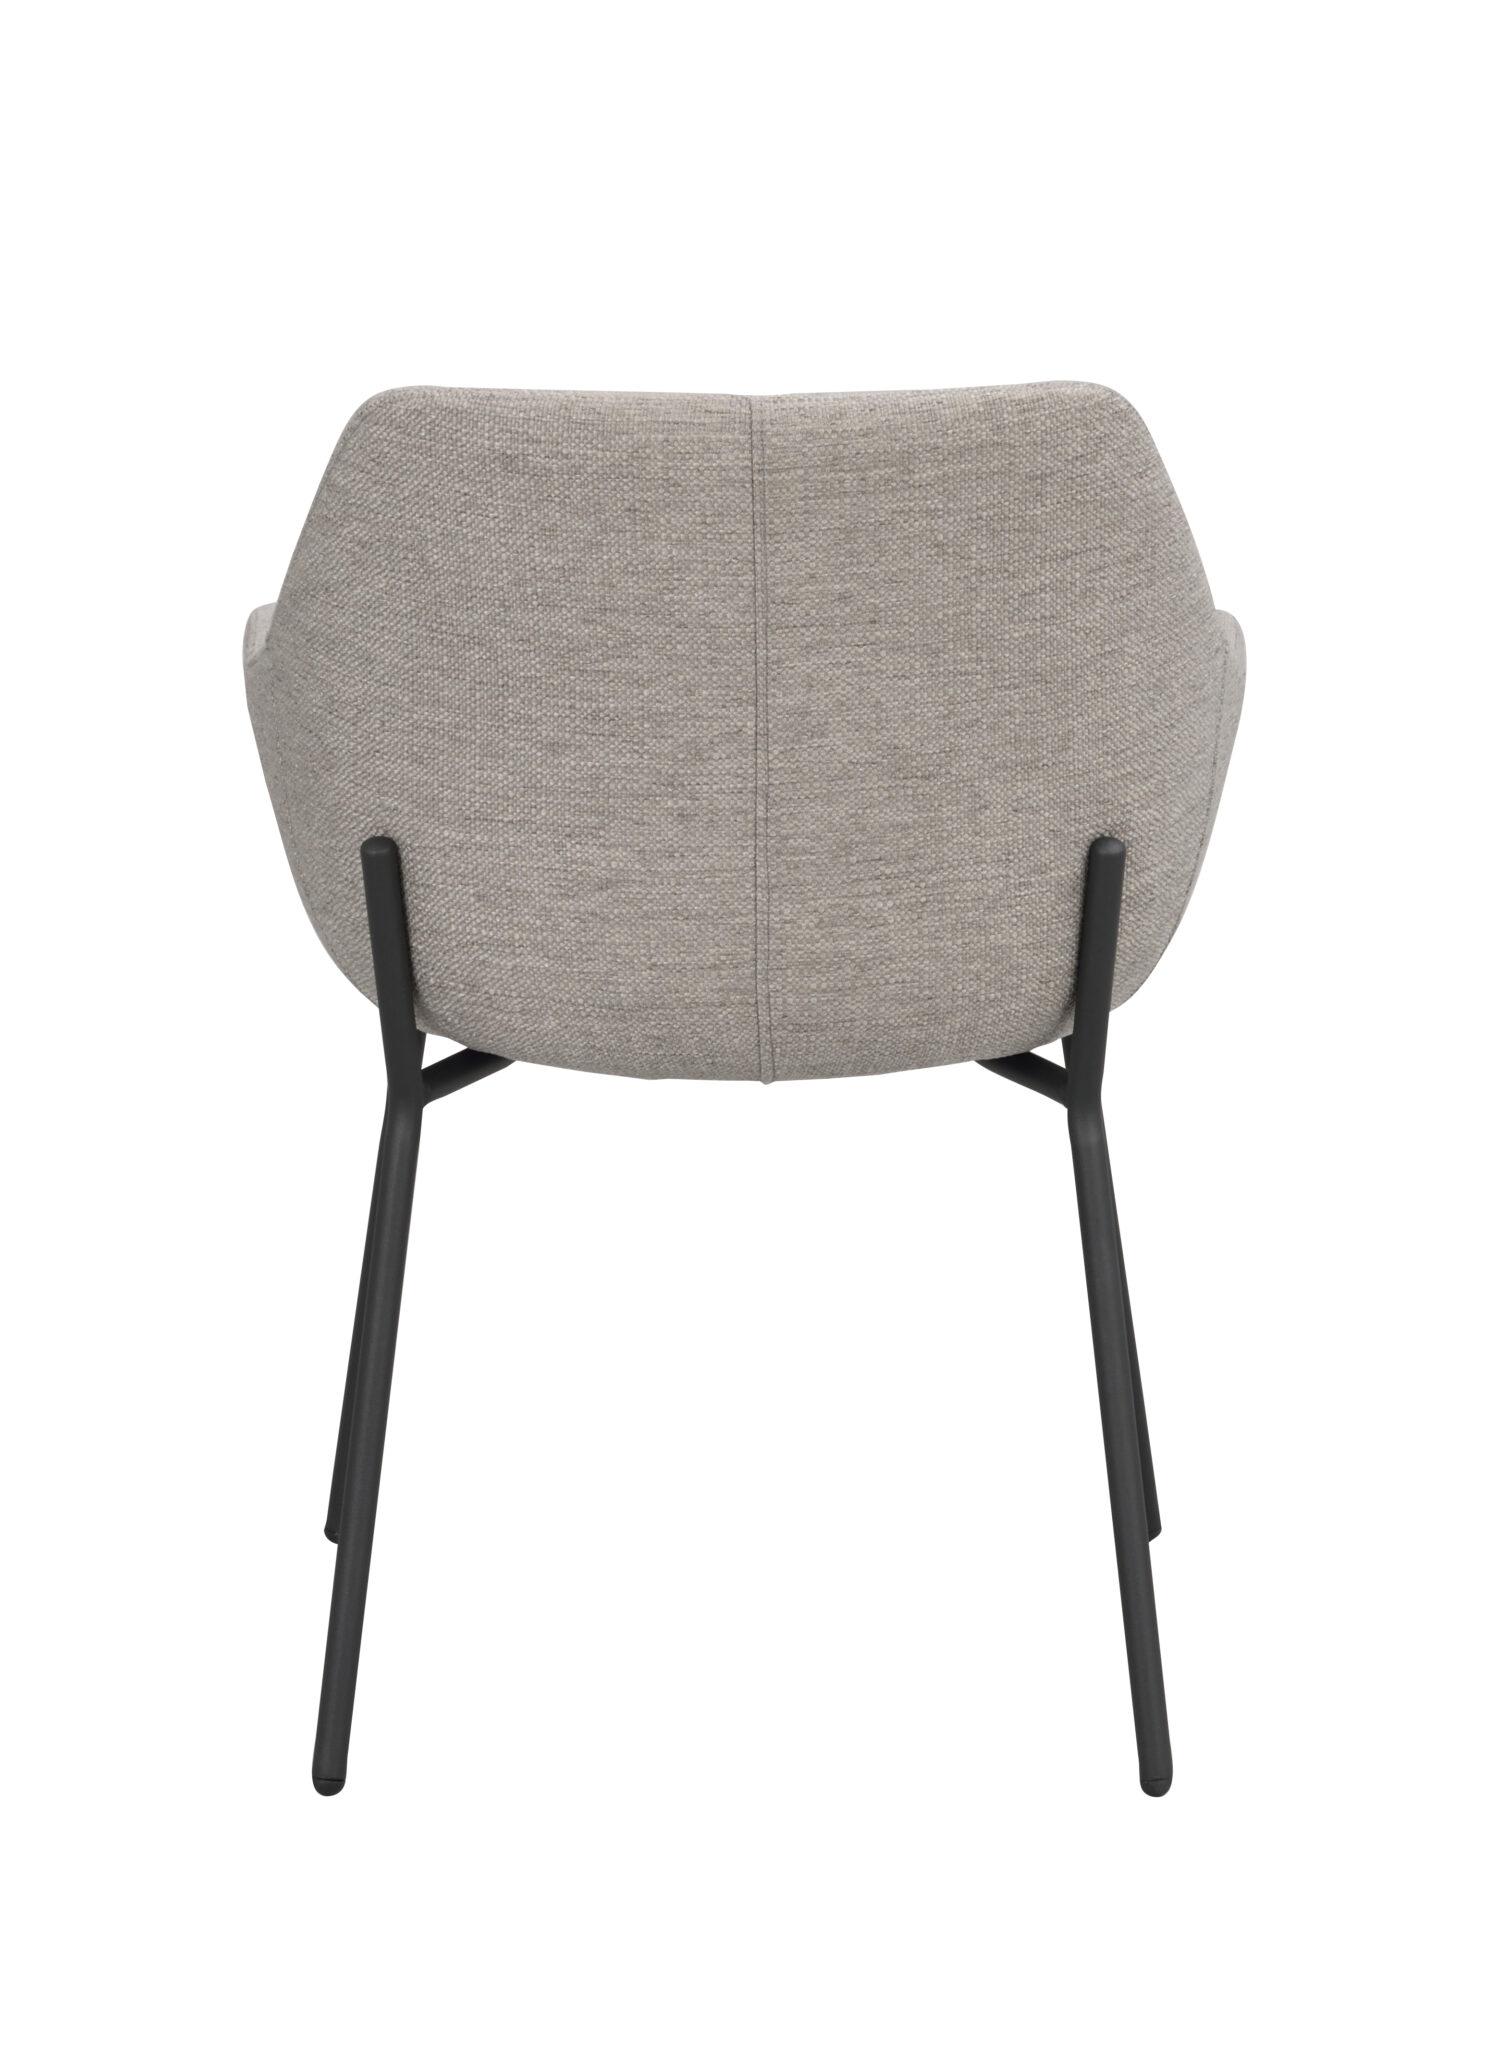 Haley arm chair Light grey_black 110480 4